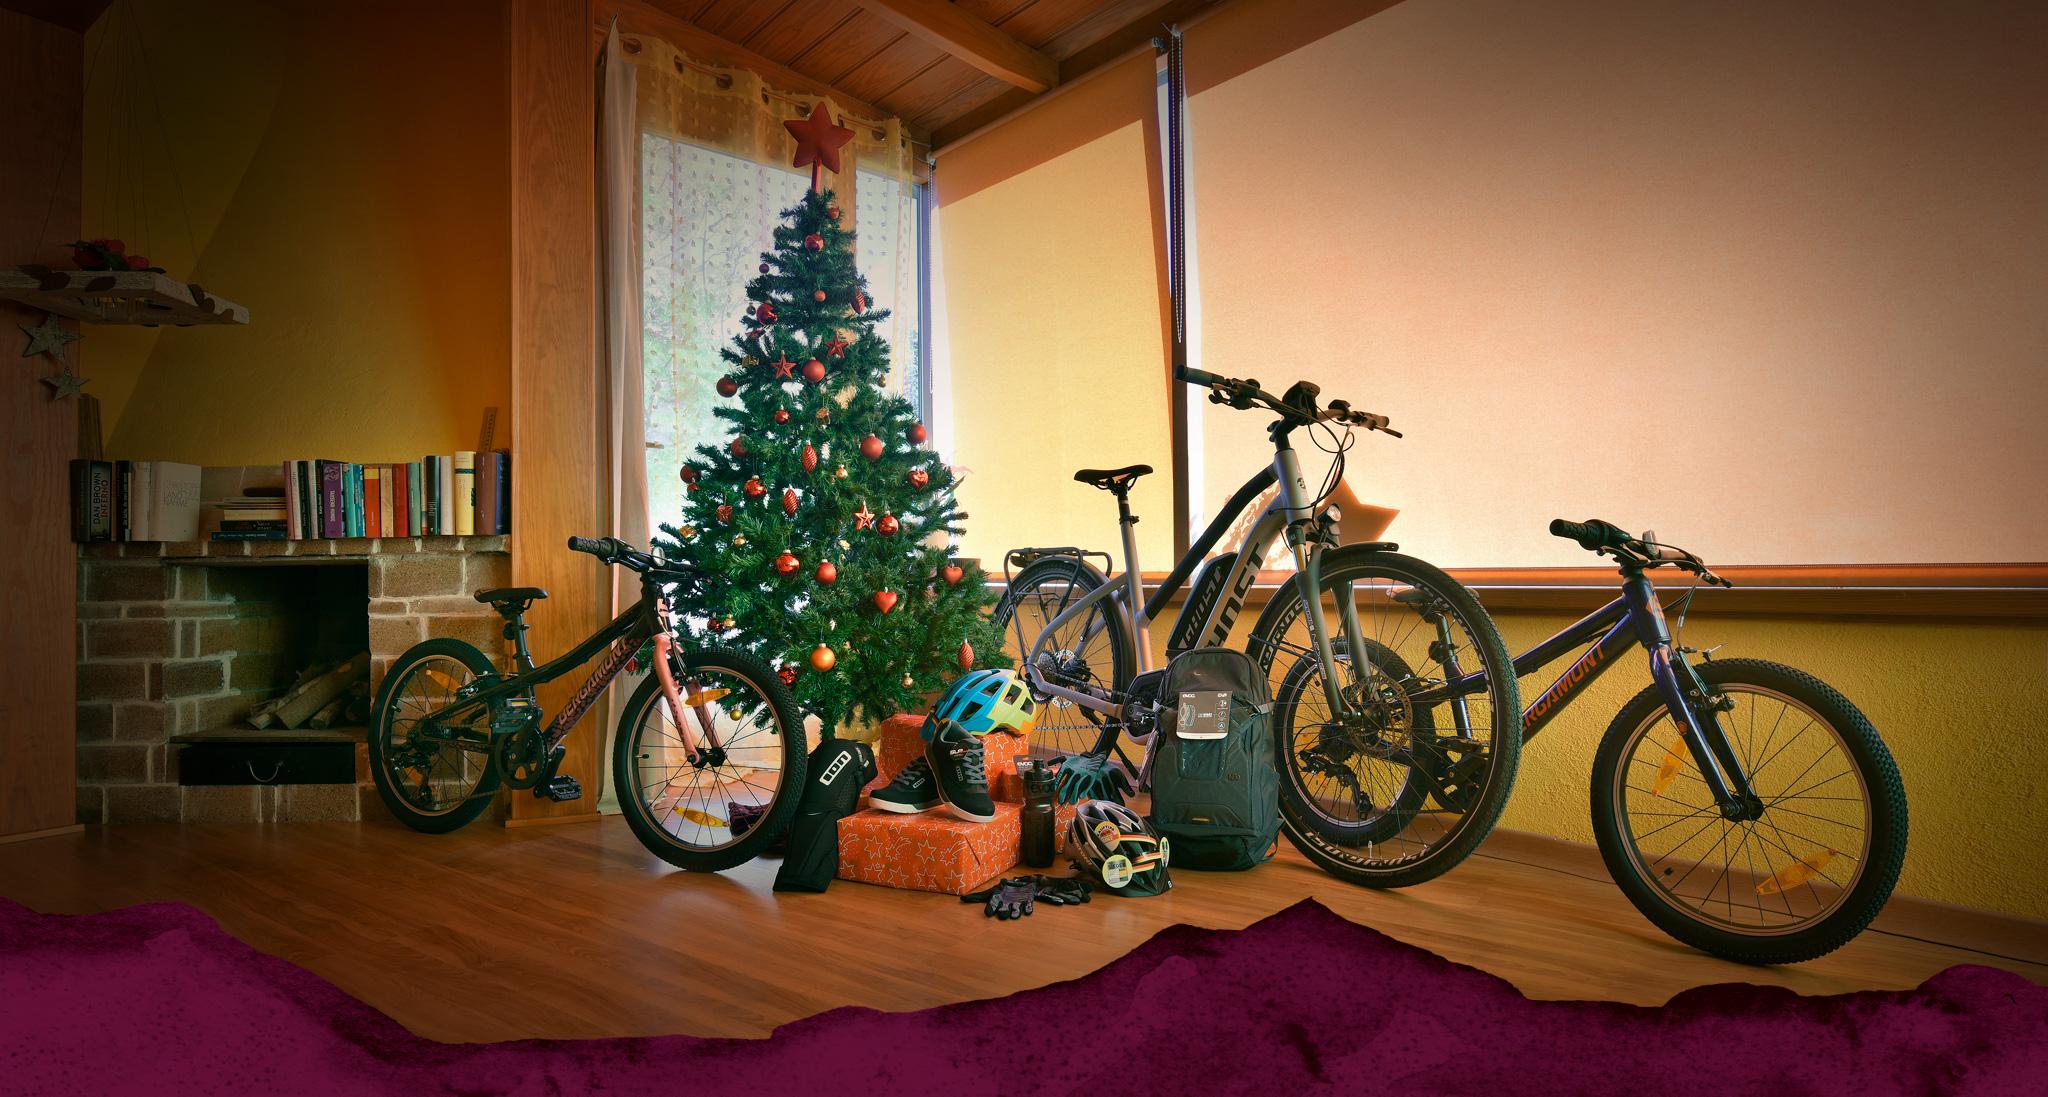 🎁 Feliz Navidad 🎁